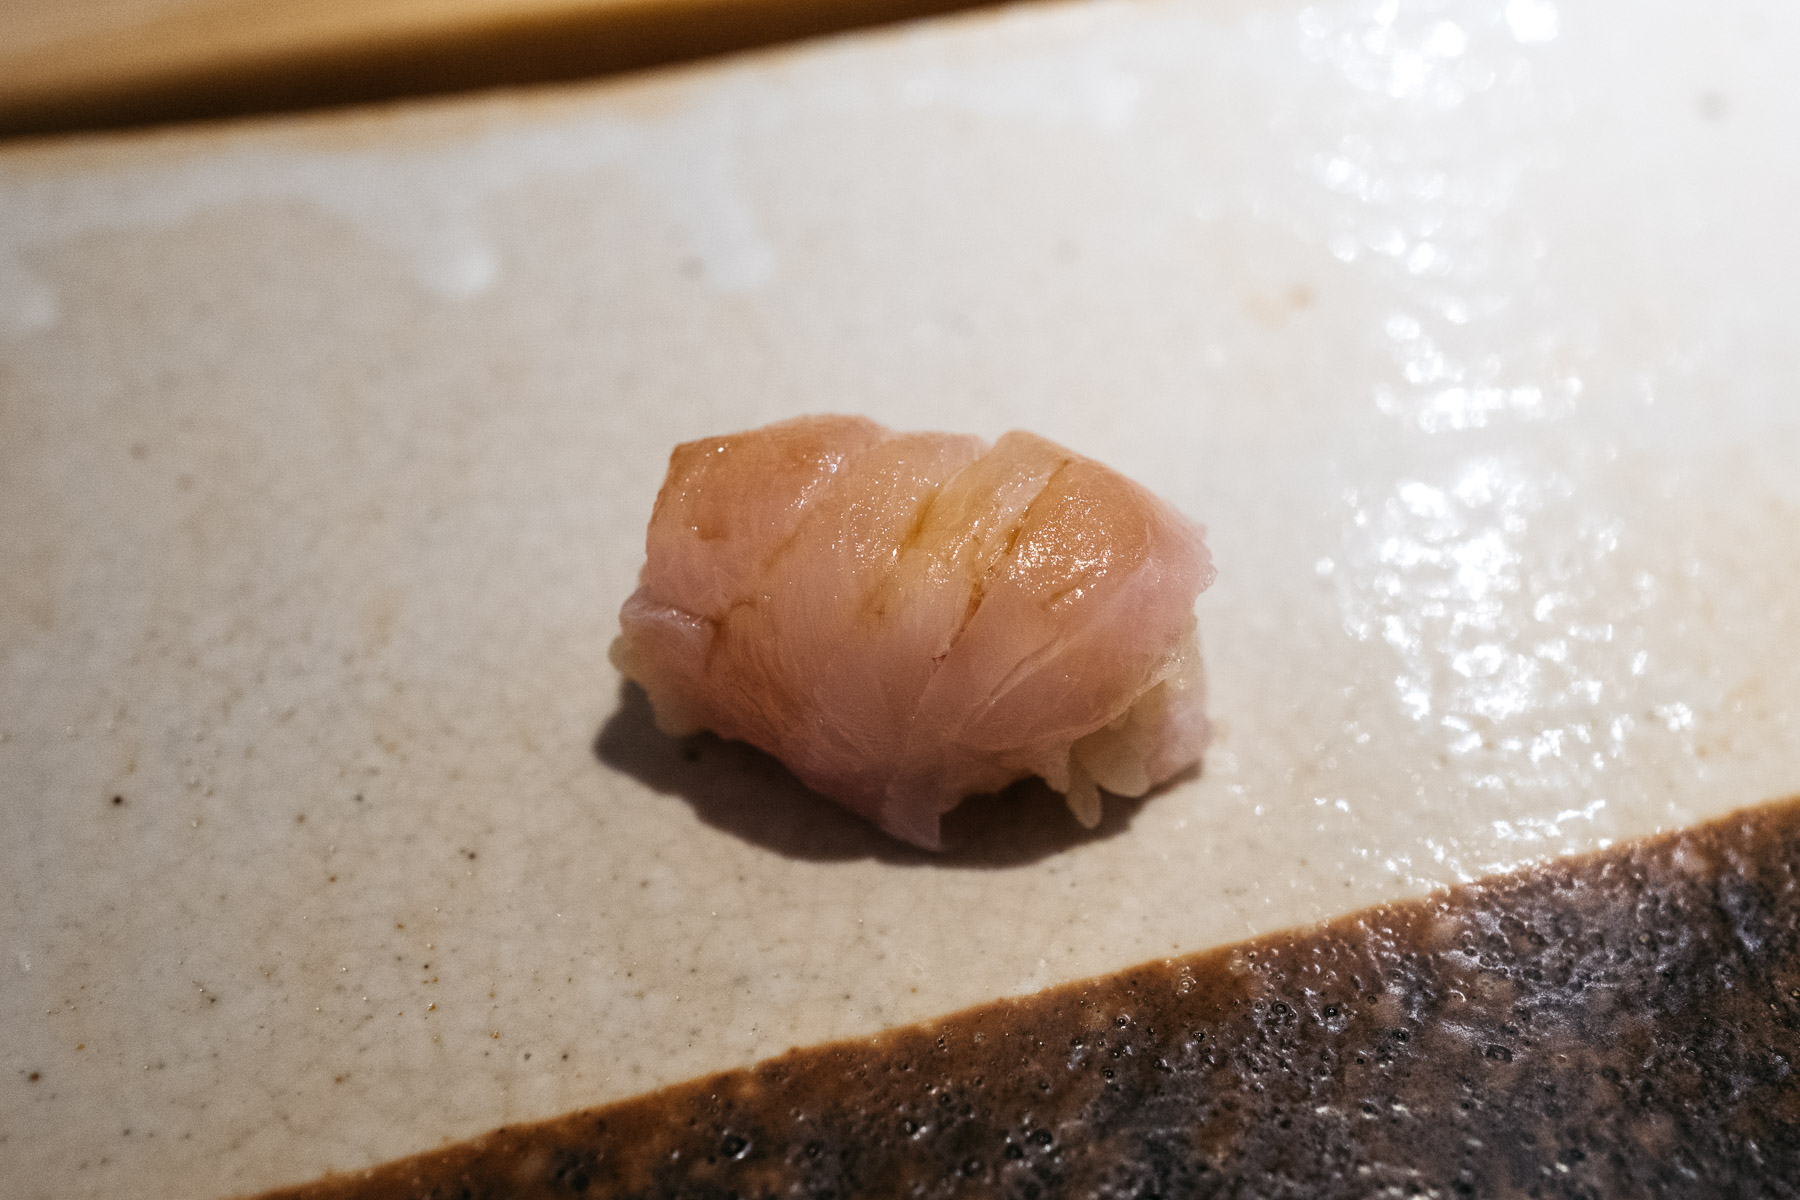 Kuro mutsu (dojrzewany w soli)